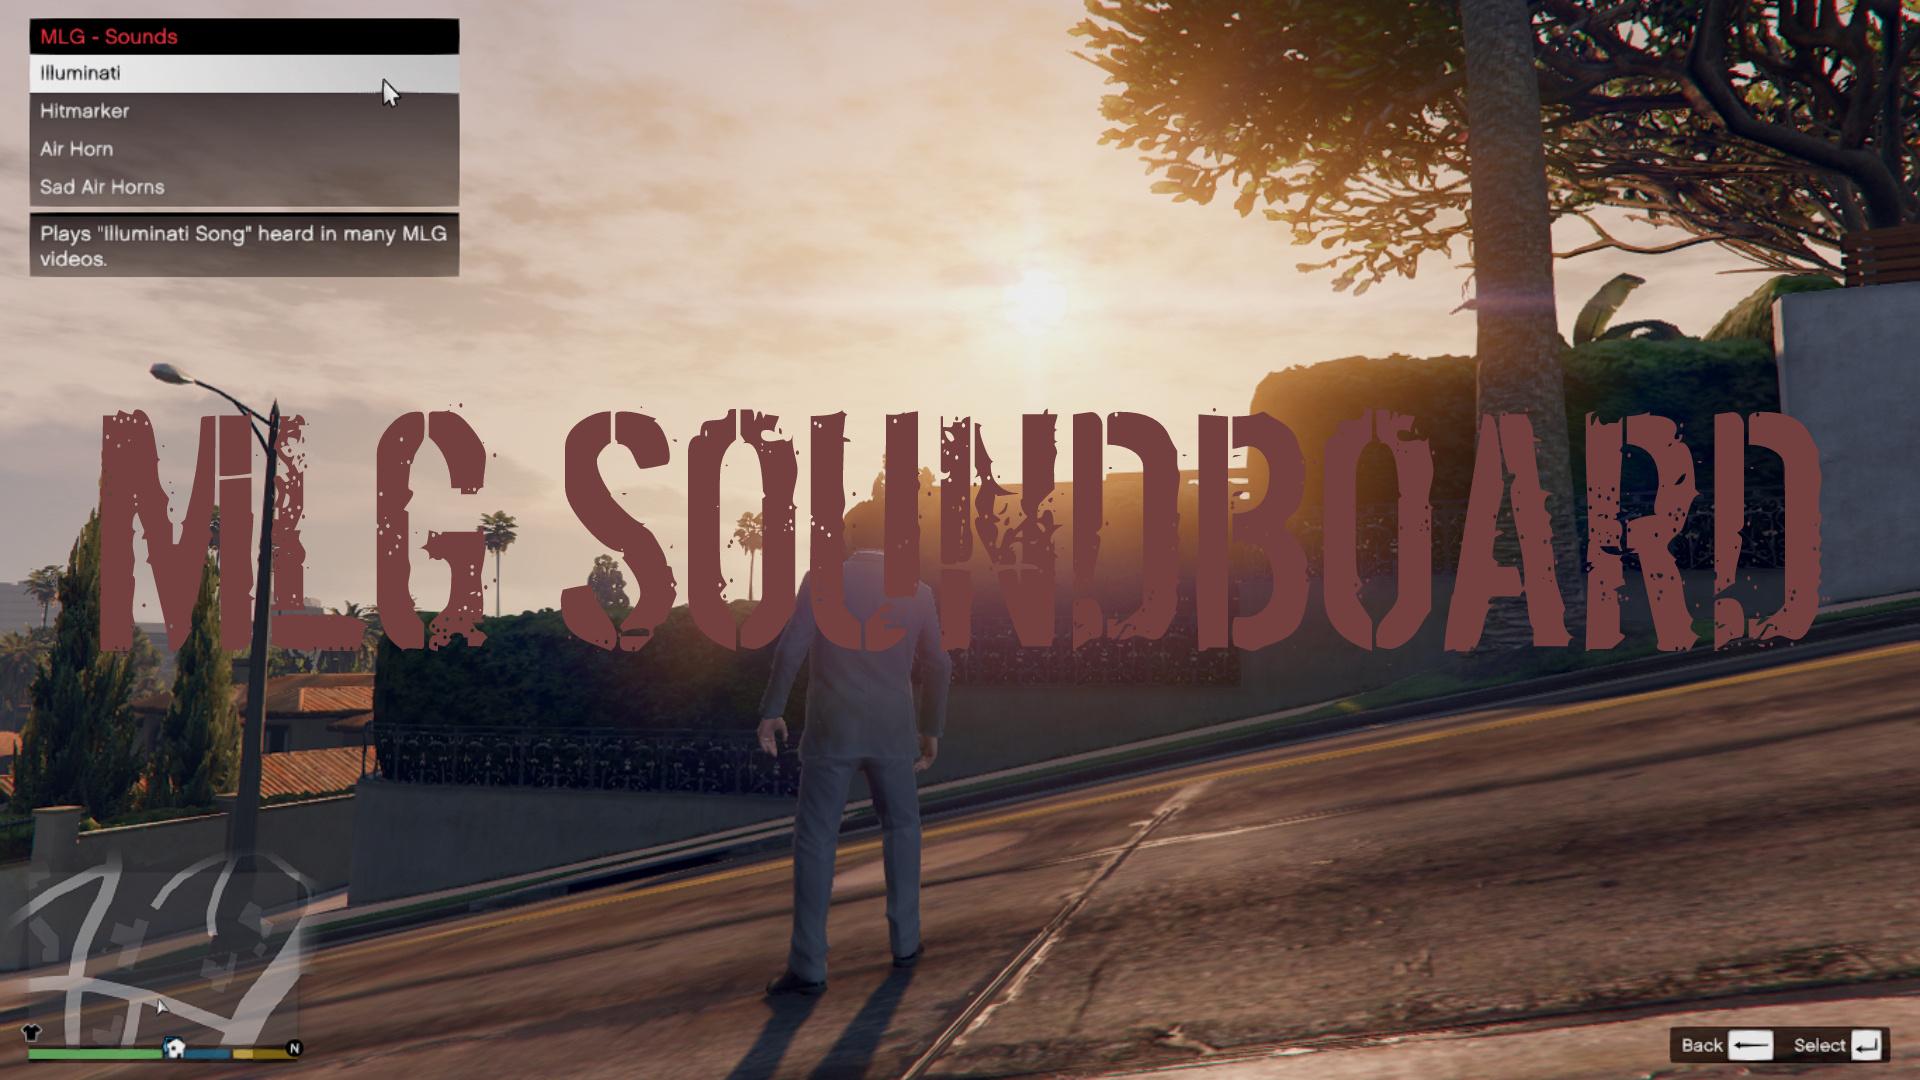 MLG Soundboard [ NET] - GTA5-Mods com